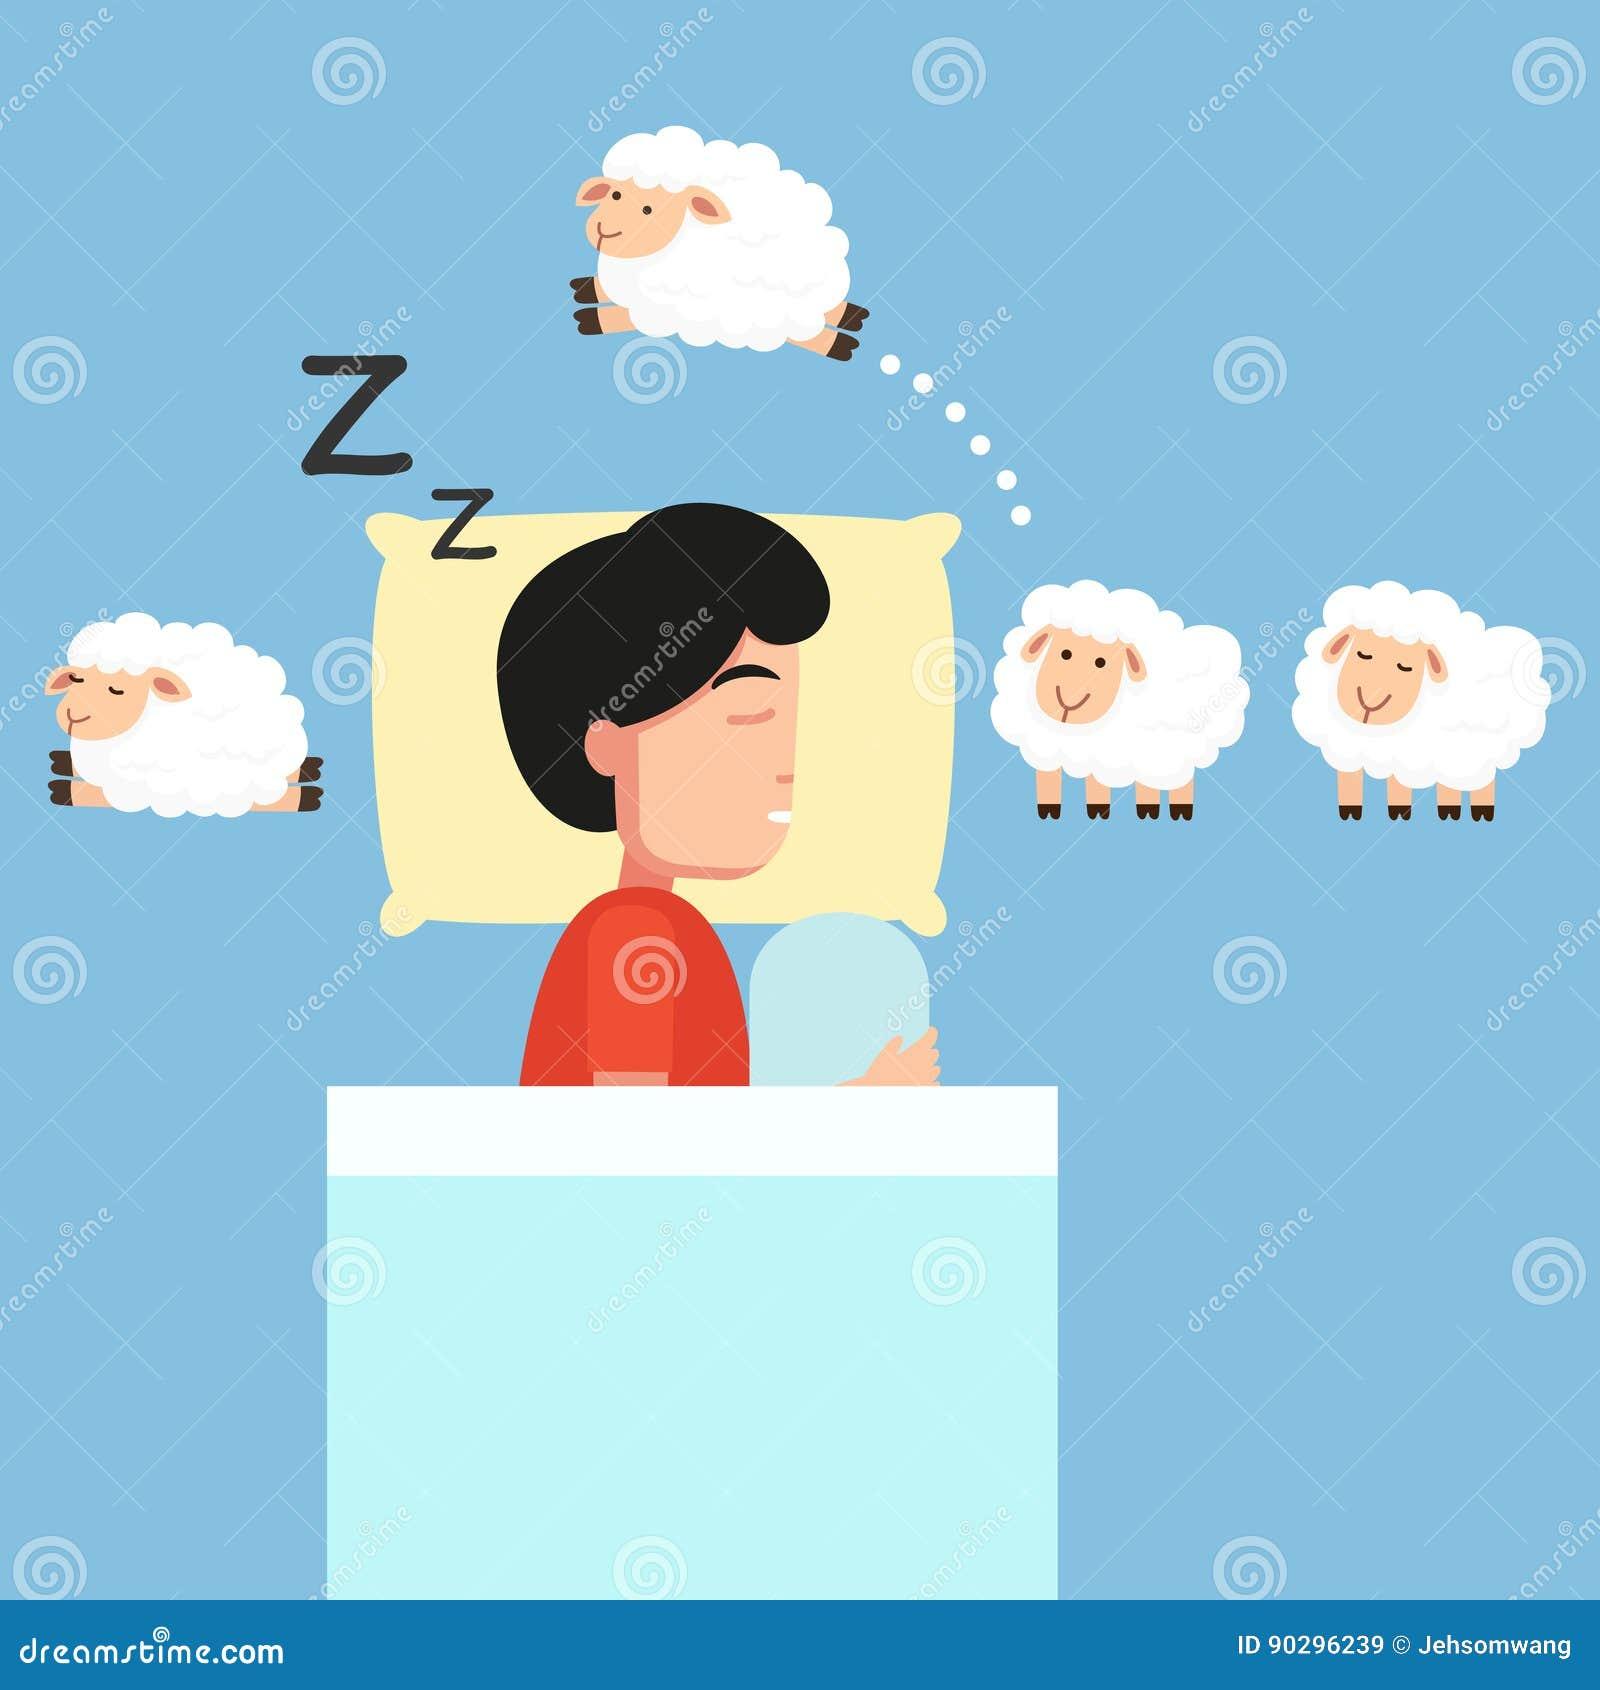 Man Sleeping,counting Sheep To Fall Asleep Illustration Man Sleeping,counting  Sheep To Fall